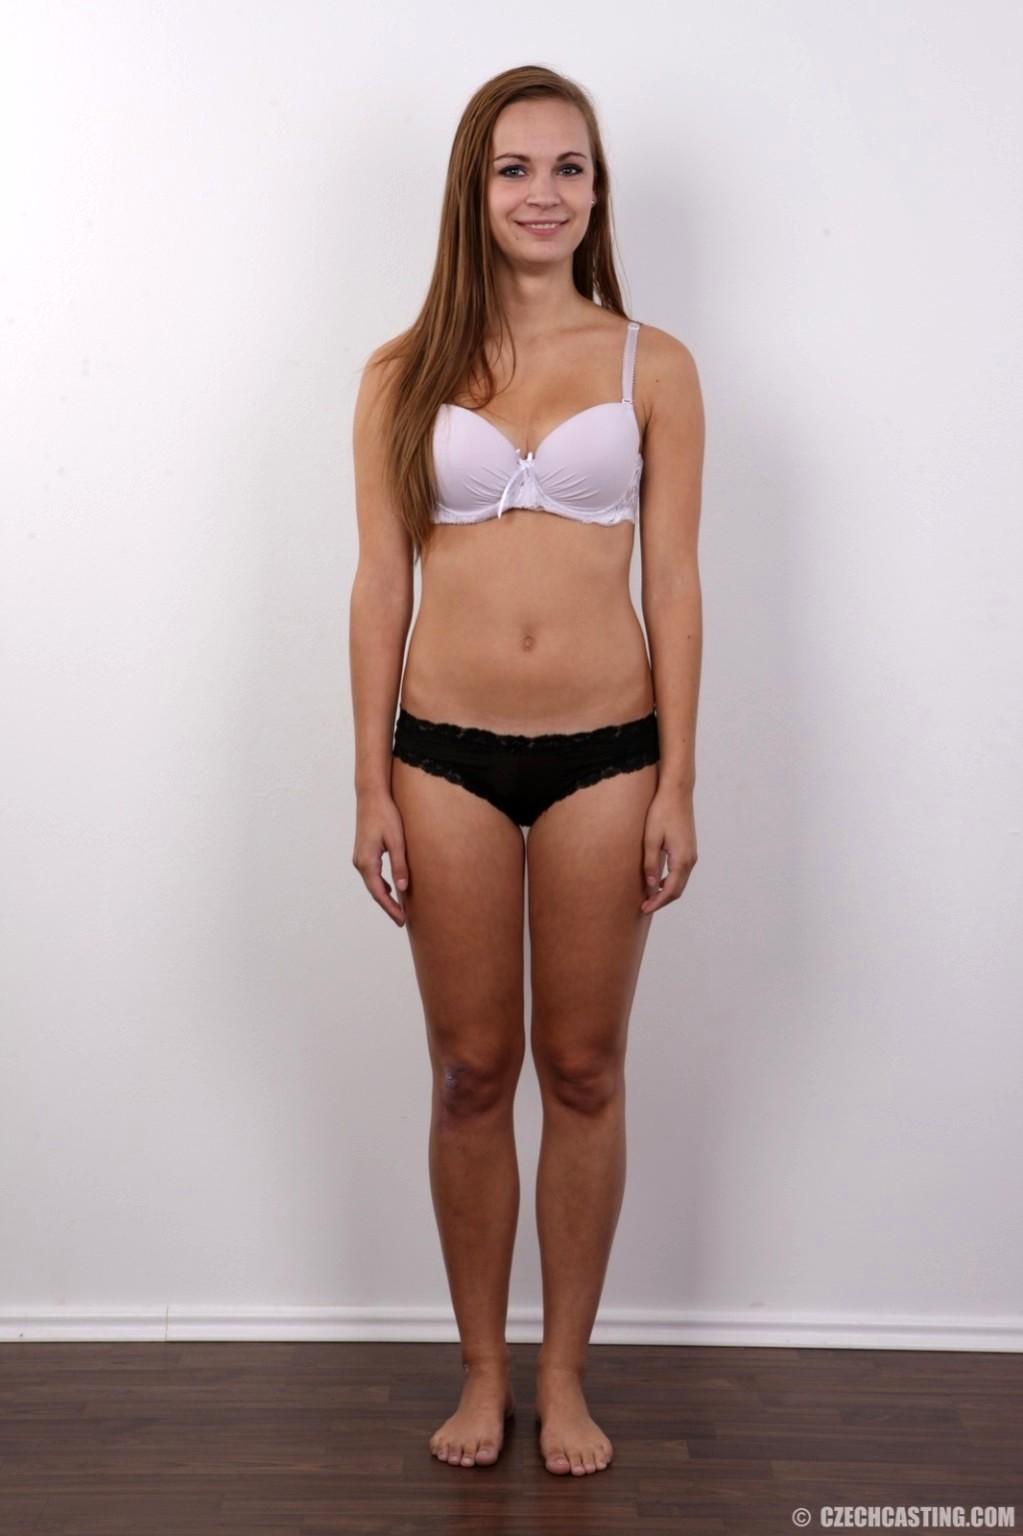 Sara boberg leaked nude